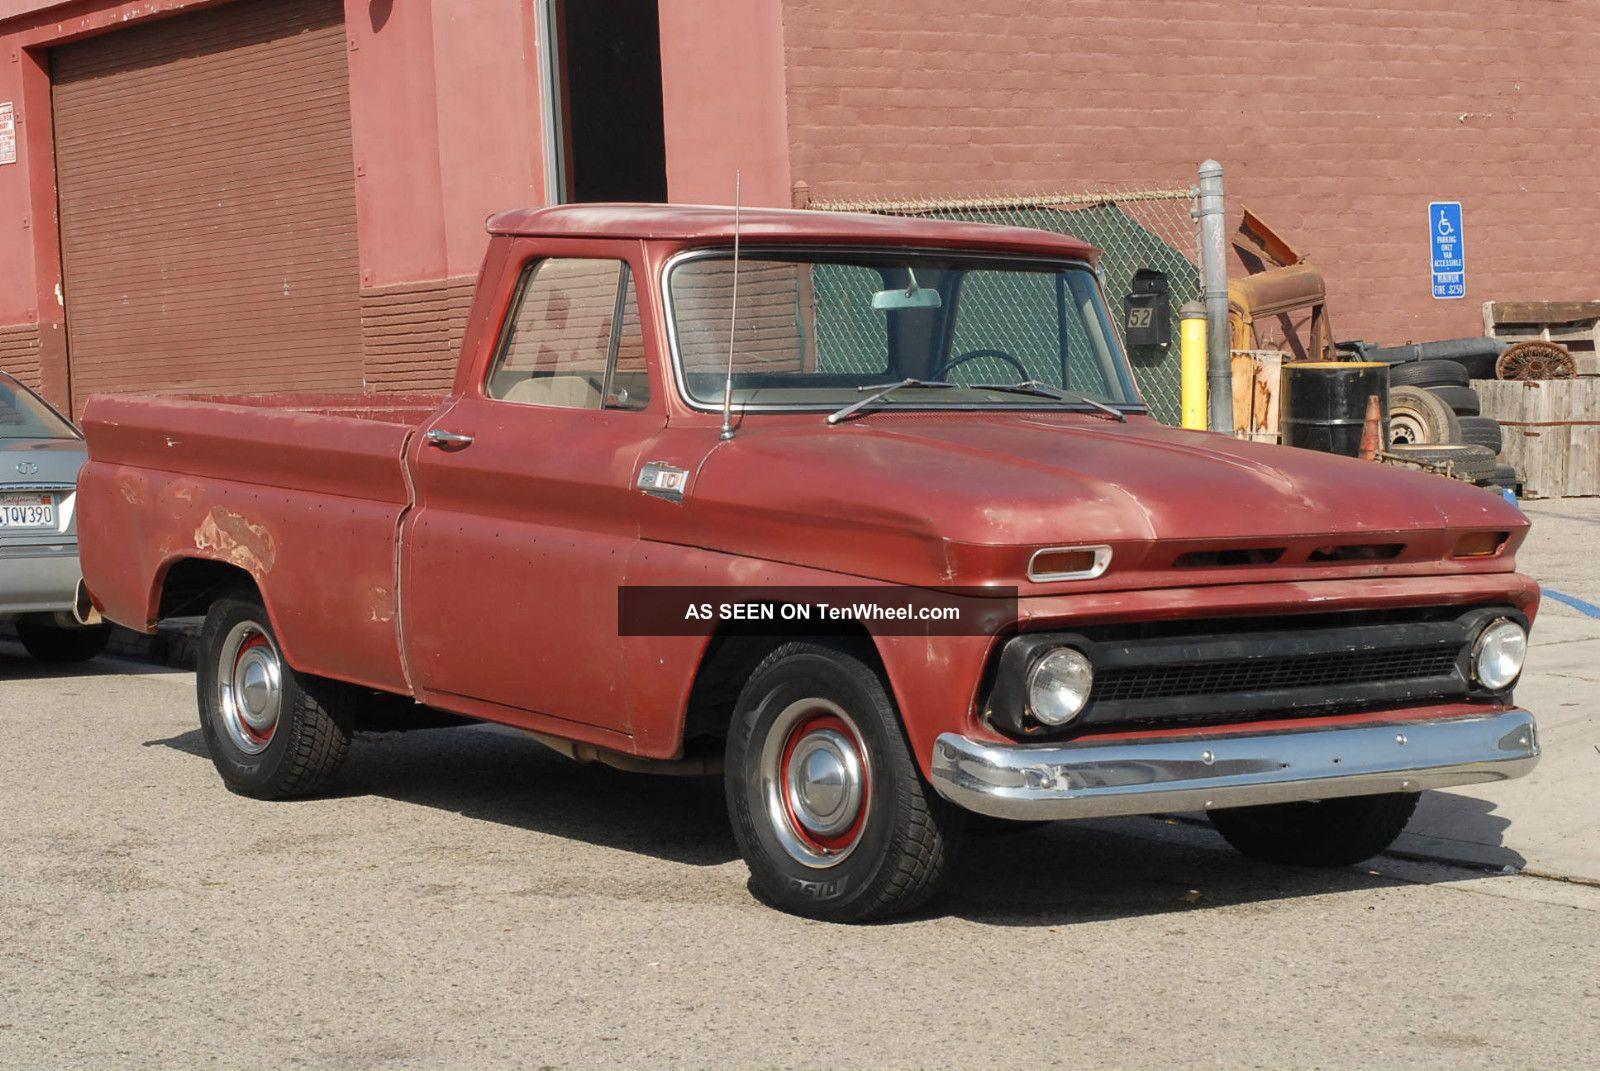 1960 1961 1962 1963 1964 1965 1966 C10 Chevy Swb Big Window Pickup Truck Pick Up